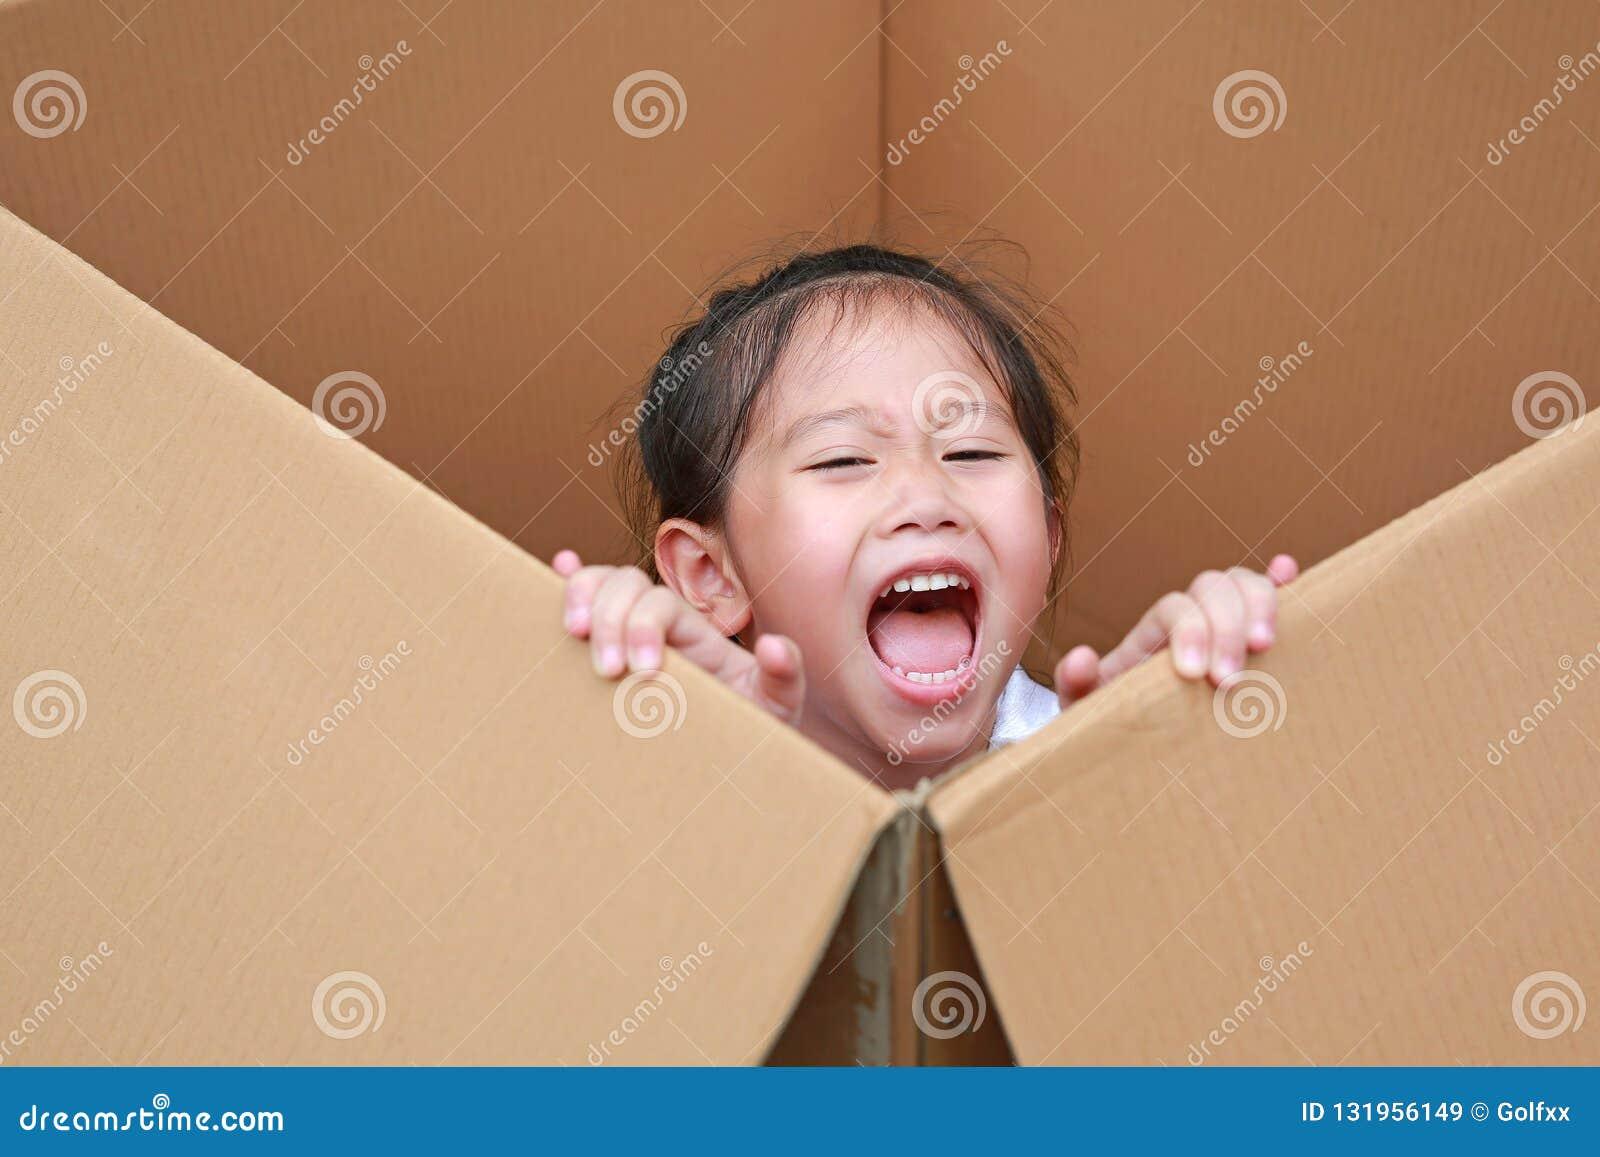 Happy little Asian child girl playing peekaboo and lie in big cardboard box